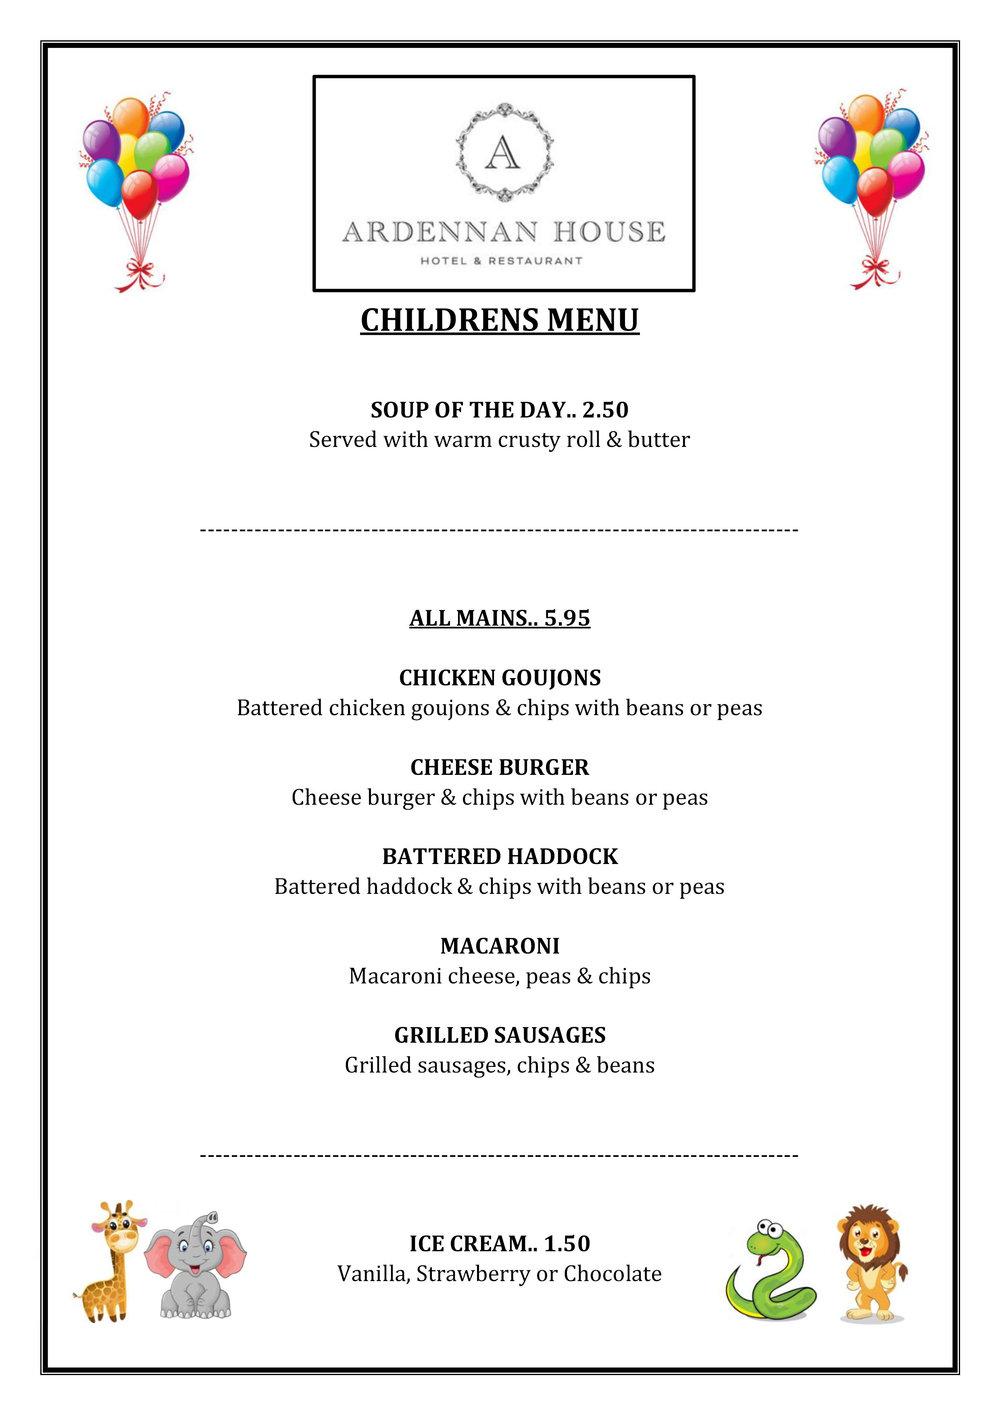 childrens menu 2018.jpg